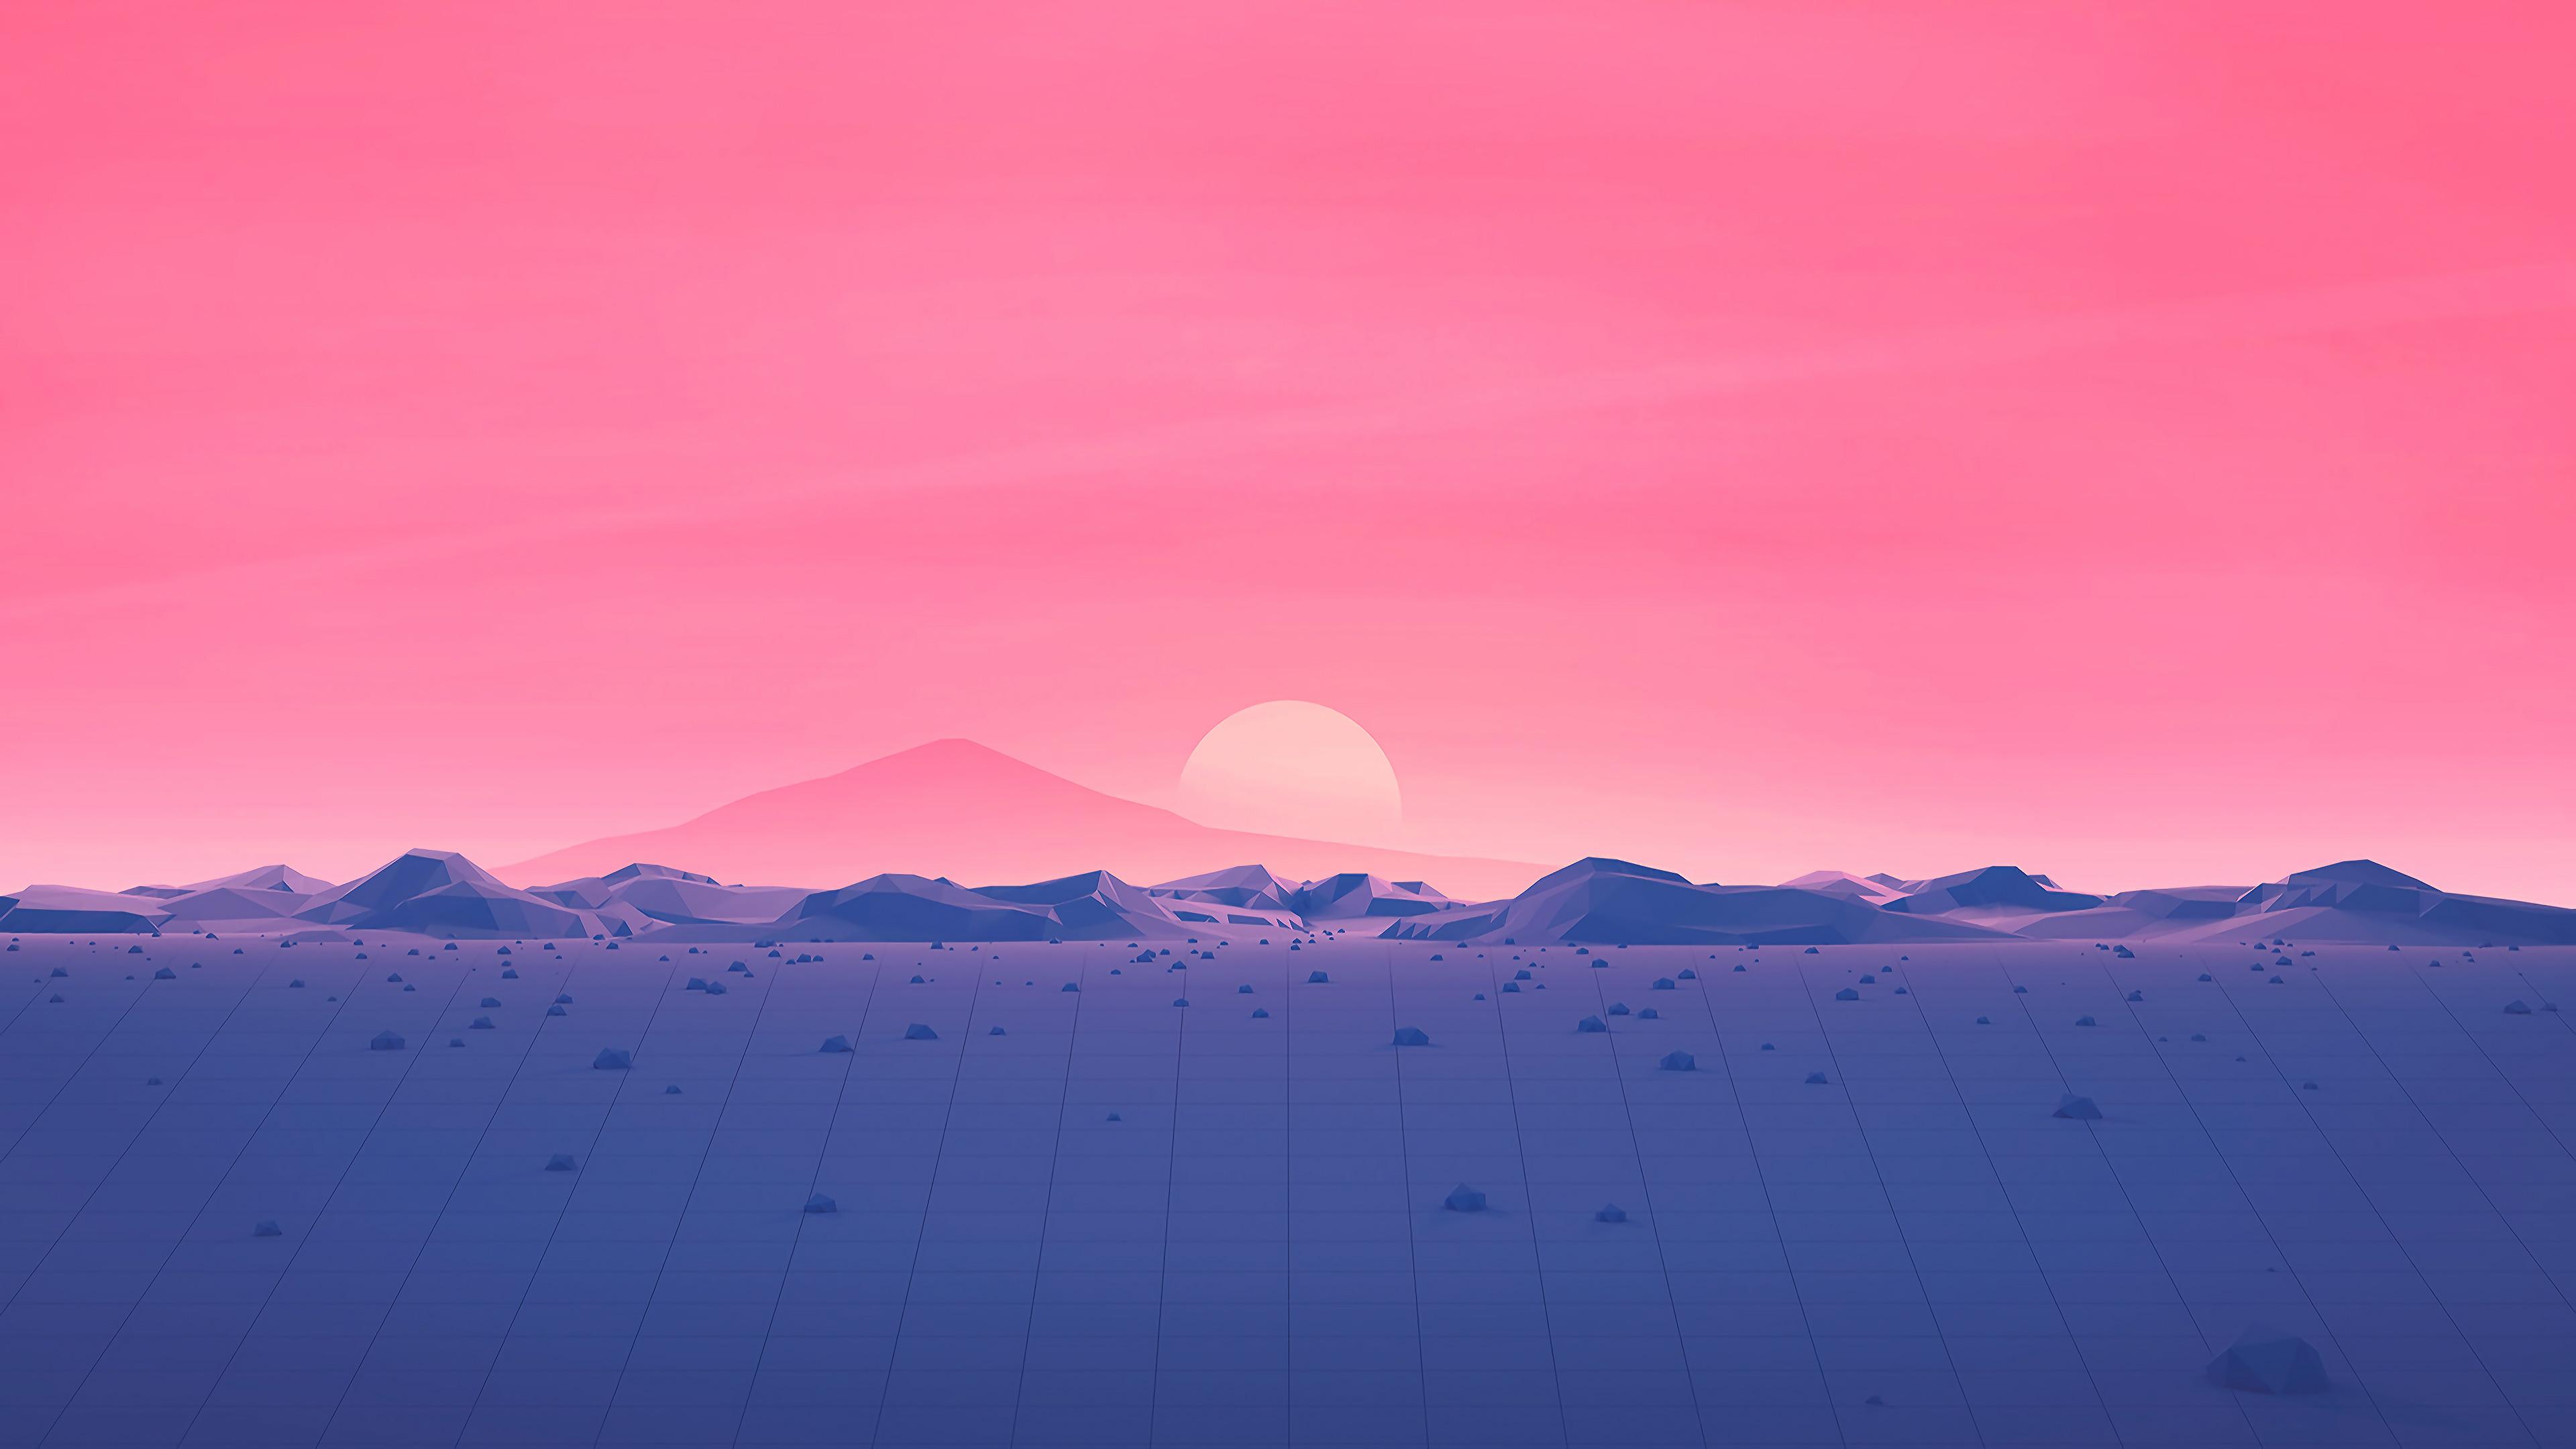 Must see Wallpaper Mountain Polygon - hotizons-sunset-polygon-surface-mountains-4k-minimalism-rp  Pic_877796.jpg